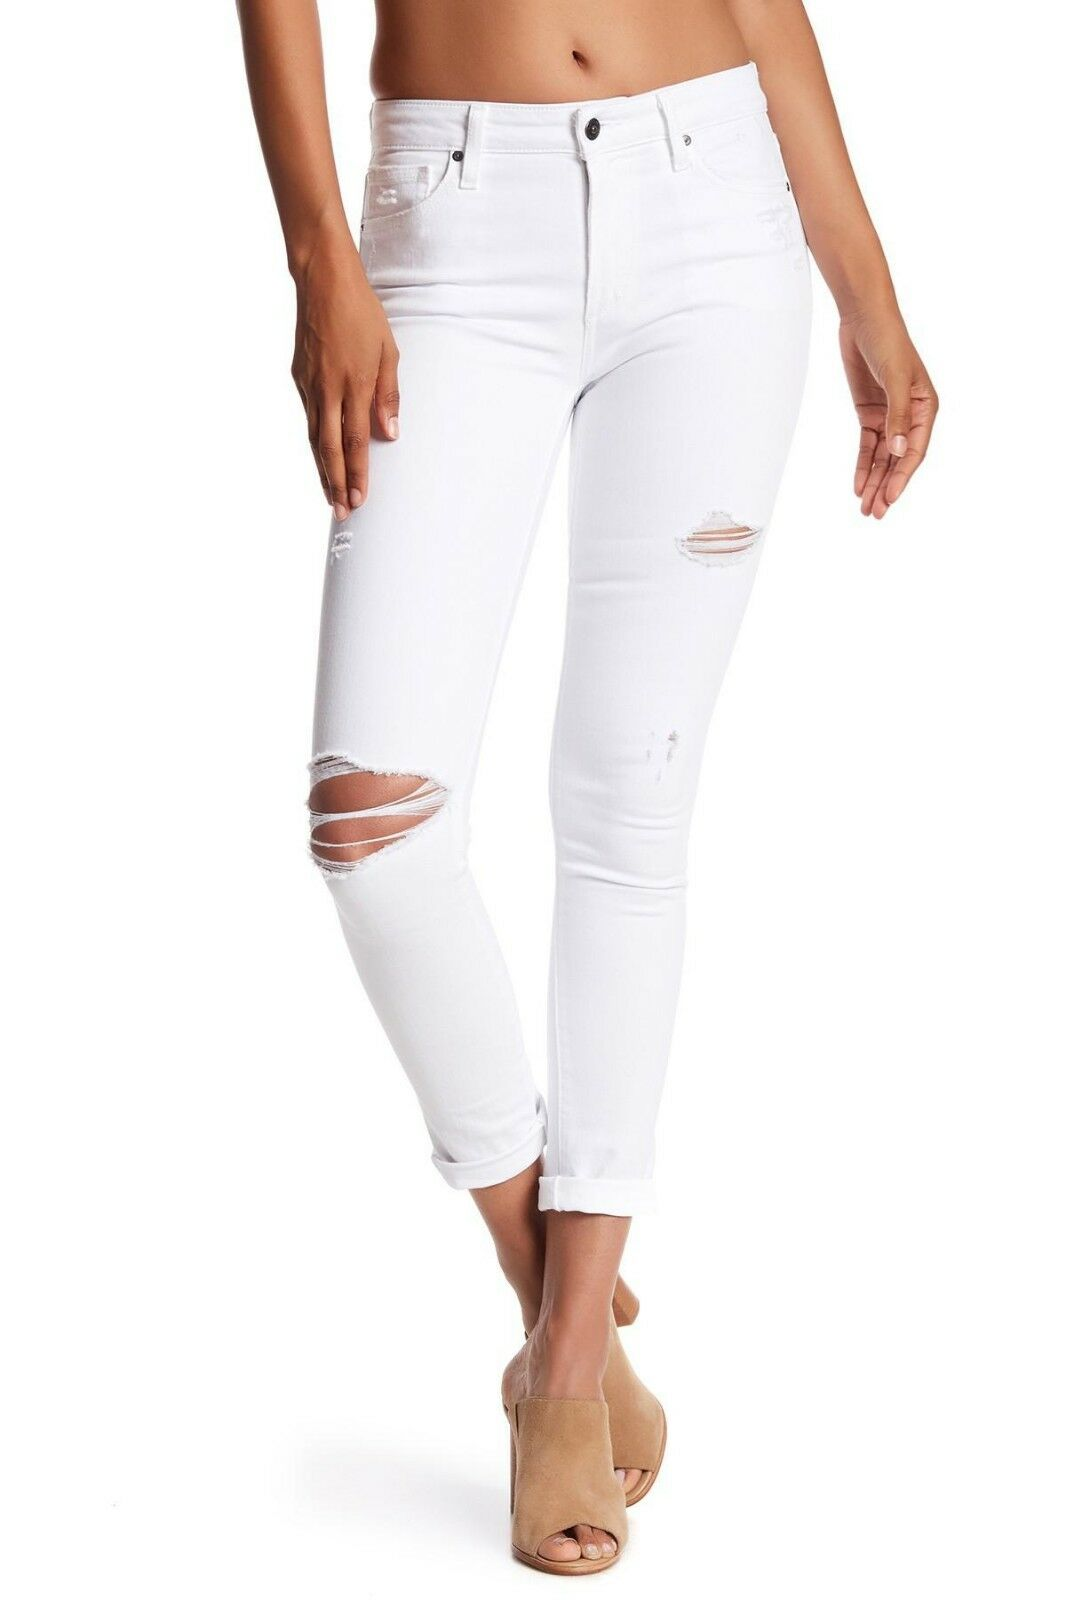 Joe's Jeans Rolled Crop Denim Pants Azami White 26 28 29 30 32 Nwt  172